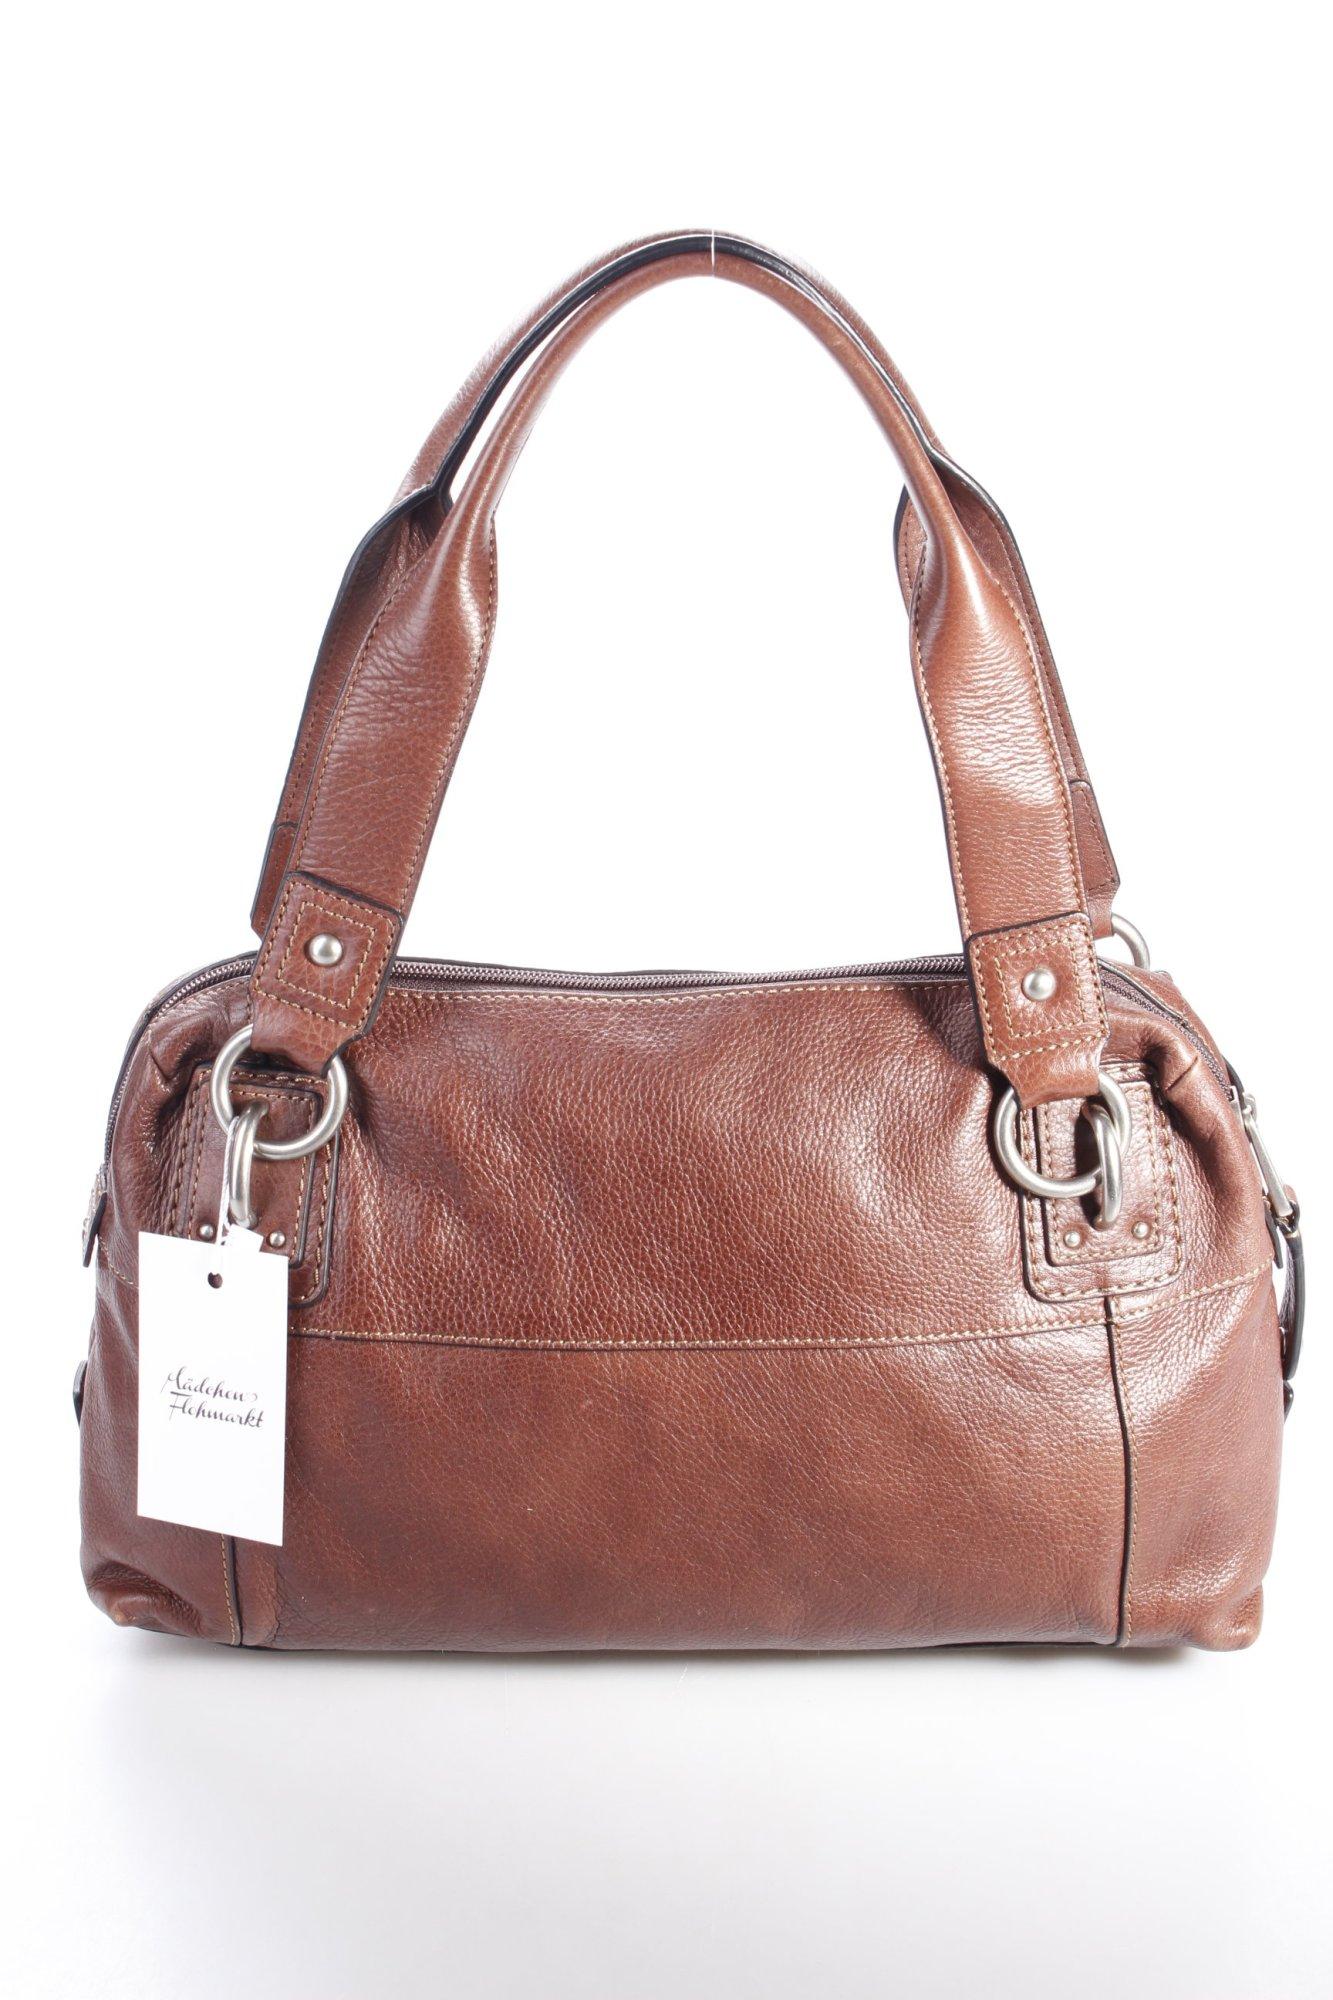 fossil henkeltasche braun damen tasche bag leder leather. Black Bedroom Furniture Sets. Home Design Ideas